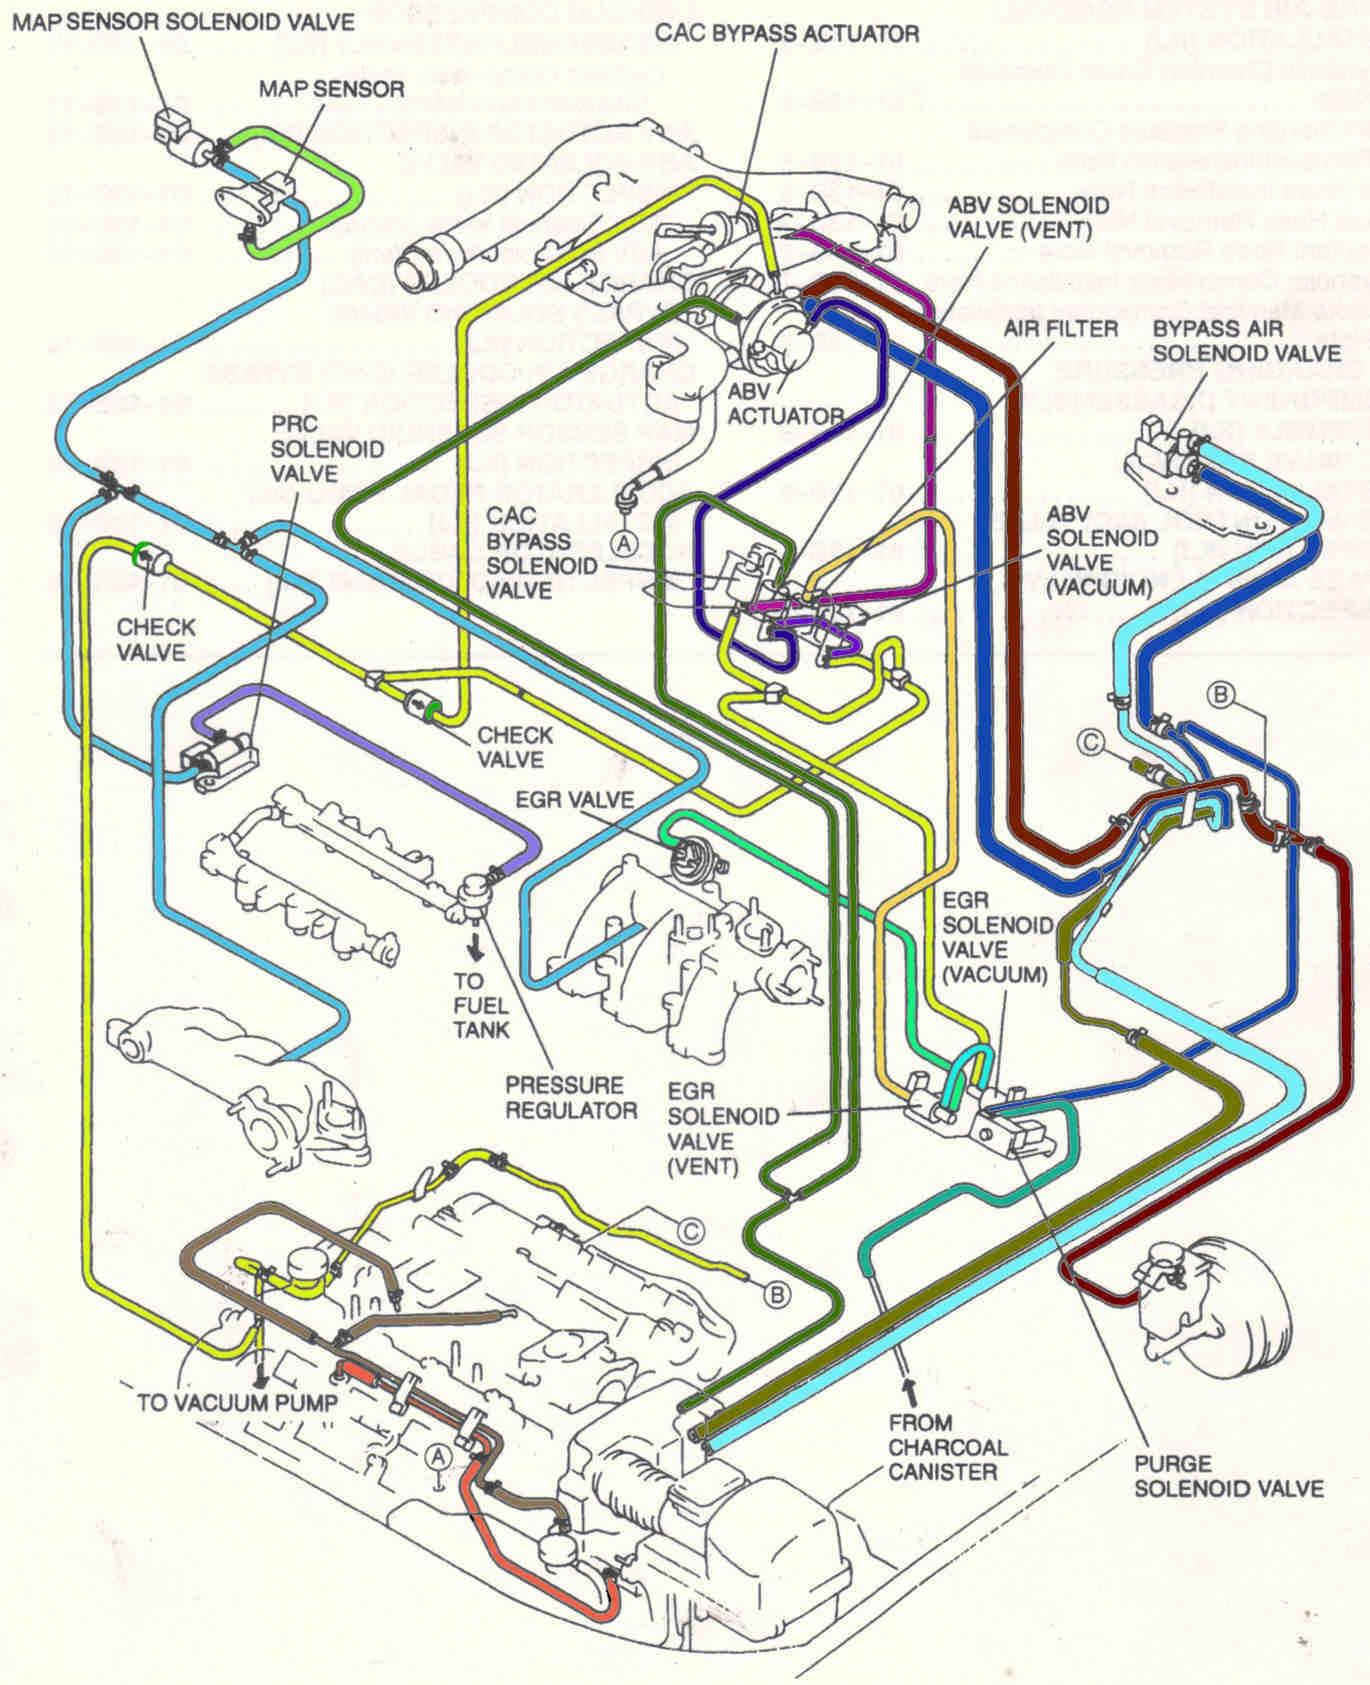 2001 Mazda Millenia Engine Diagram Help Mazda forum Of 2001 Mazda Millenia Engine Diagram